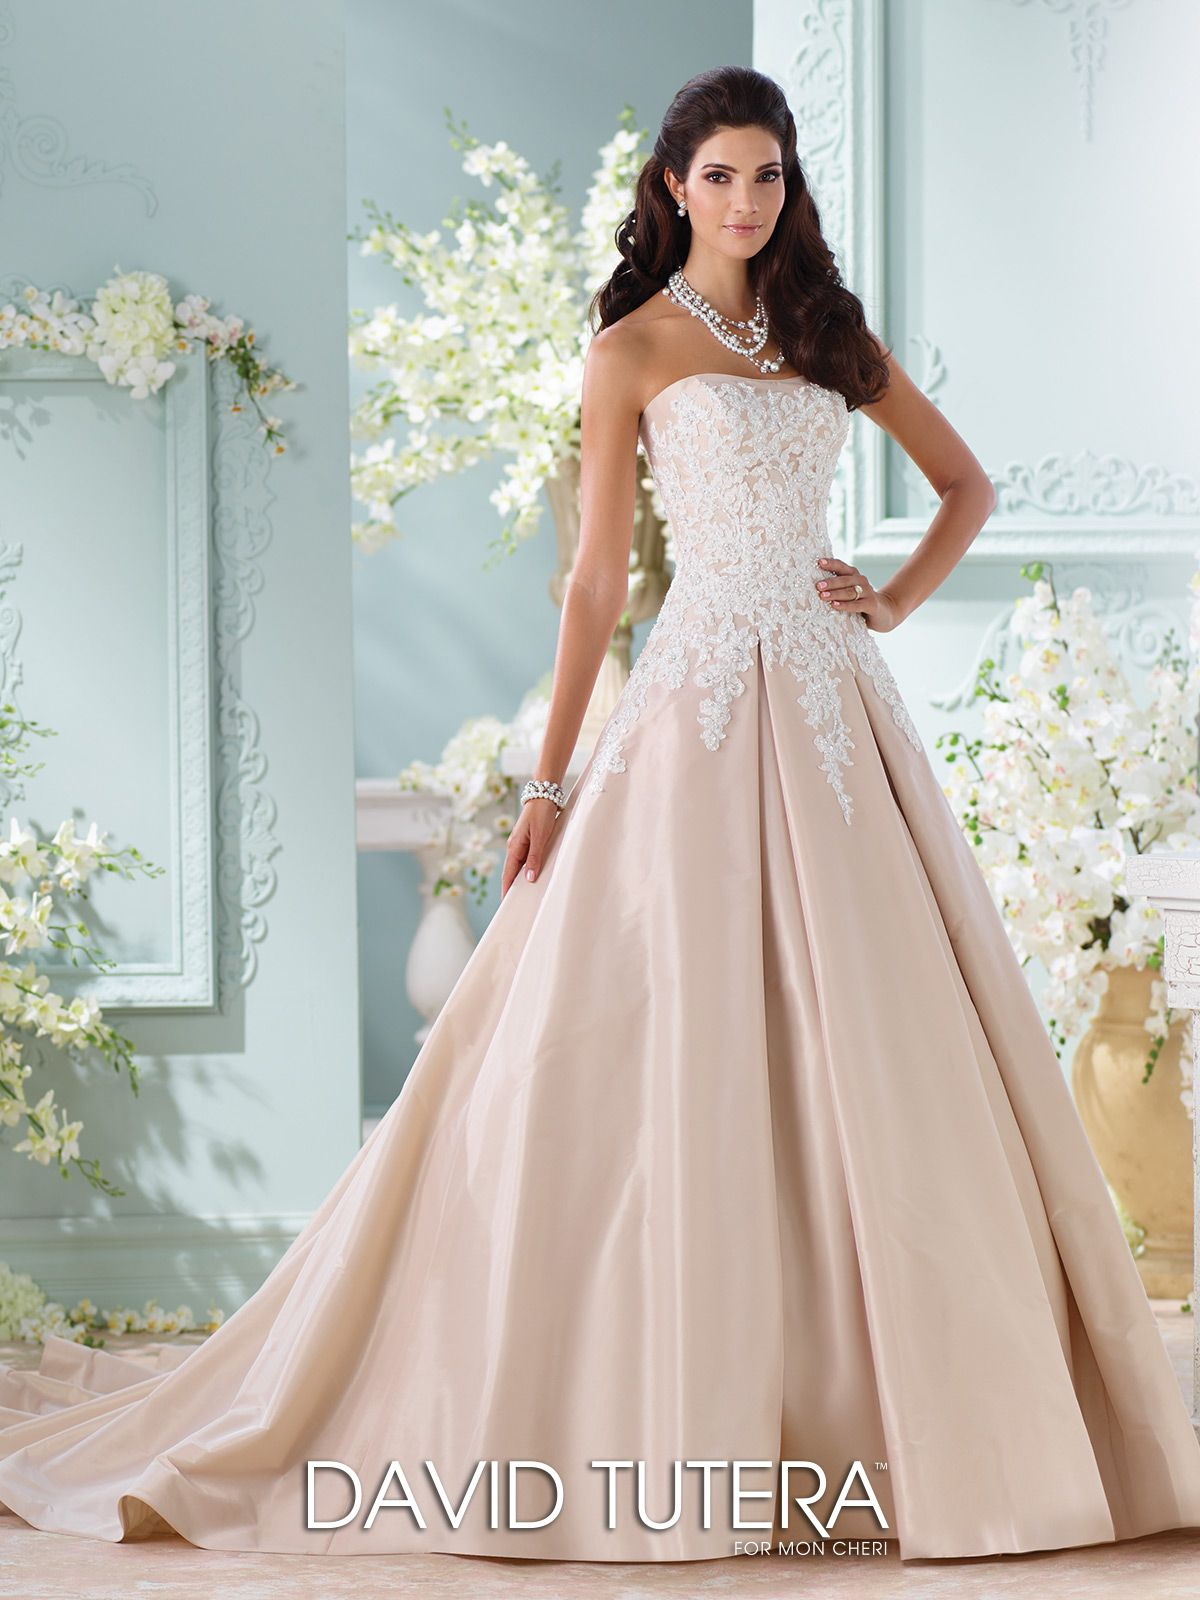 Unique Wedding Dresses Fall 2018 - Martin Thornburg | Champagne ...